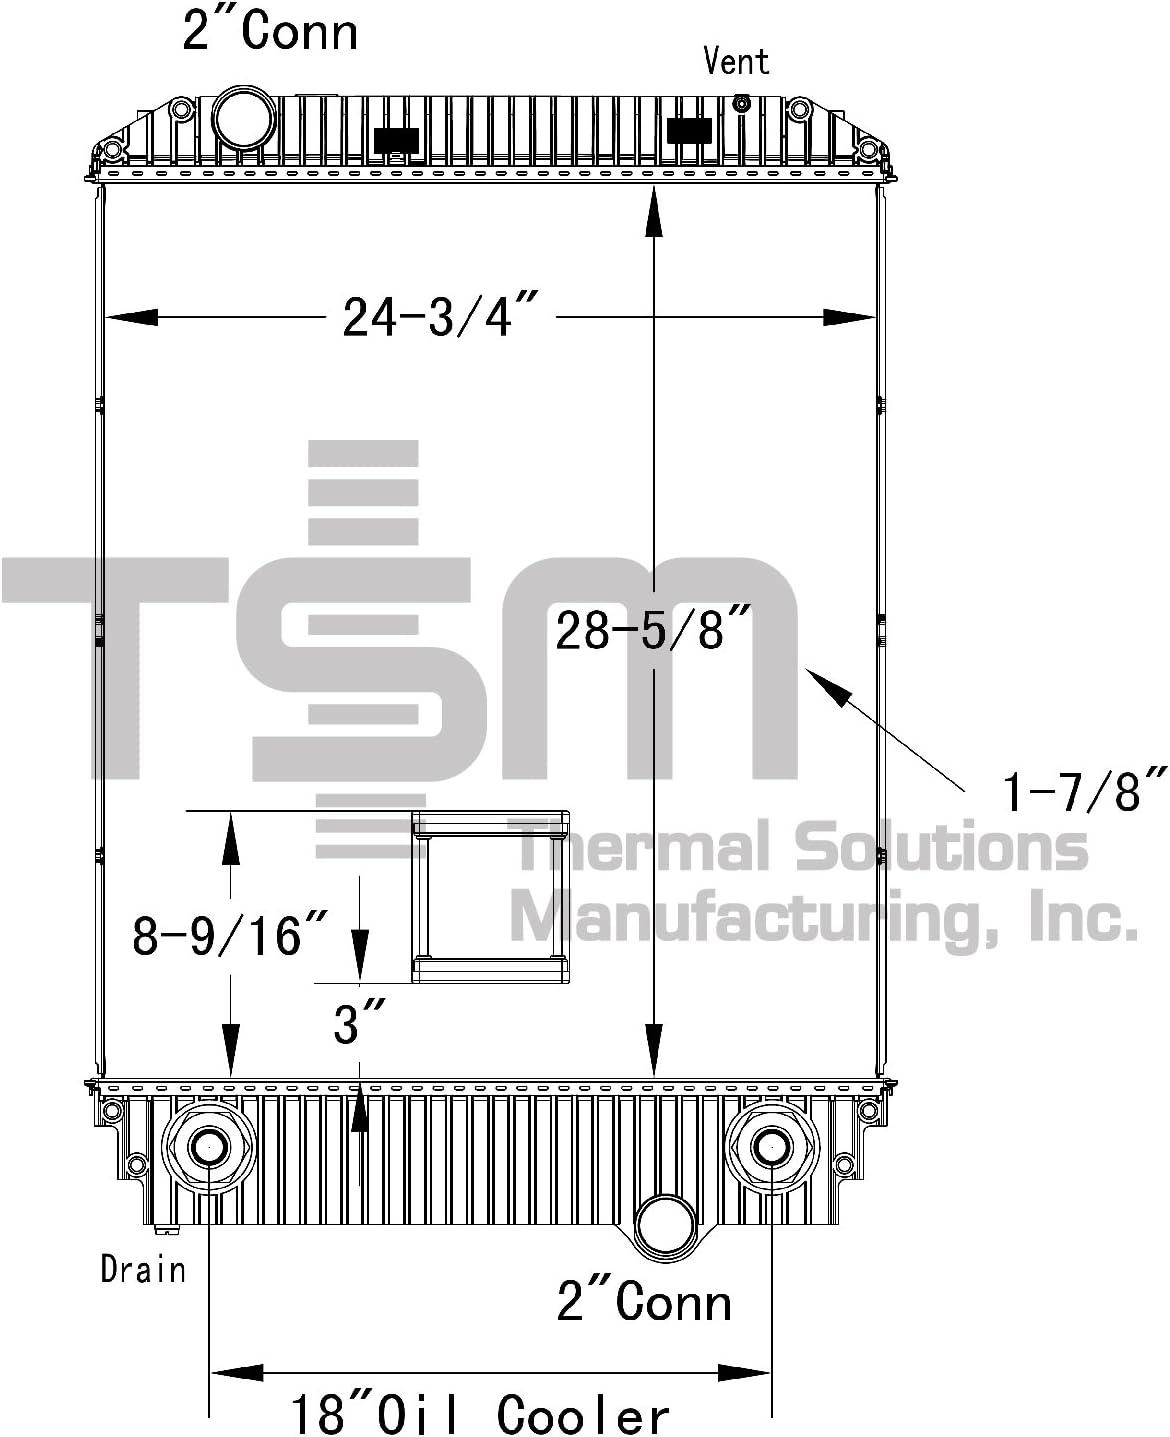 2001 freightliner fl80 wiring diagram free picture amazon com tsmusa plastic tank radiator for freightliner fl50  tank radiator for freightliner fl50